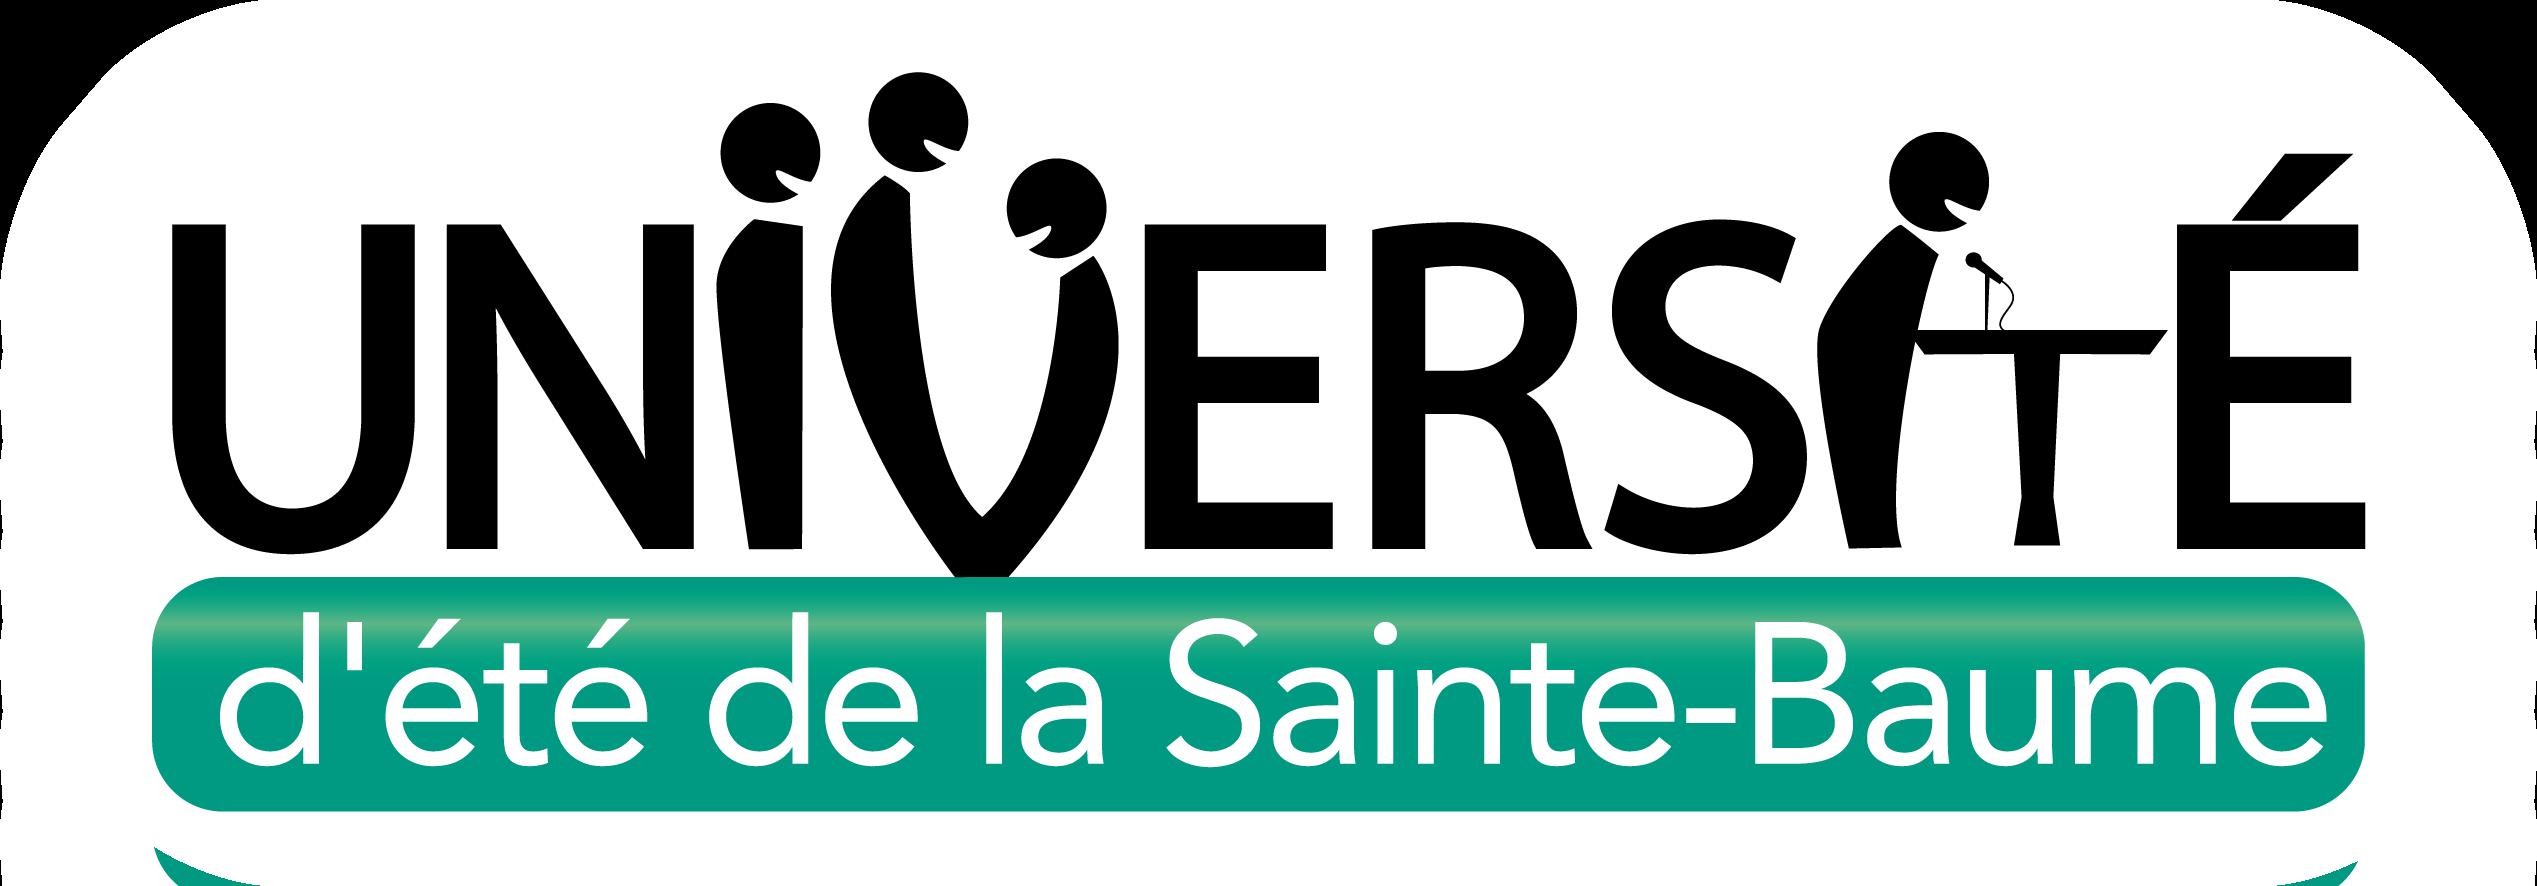 Logo_universite_ete_sainte_baume_fond_blanc